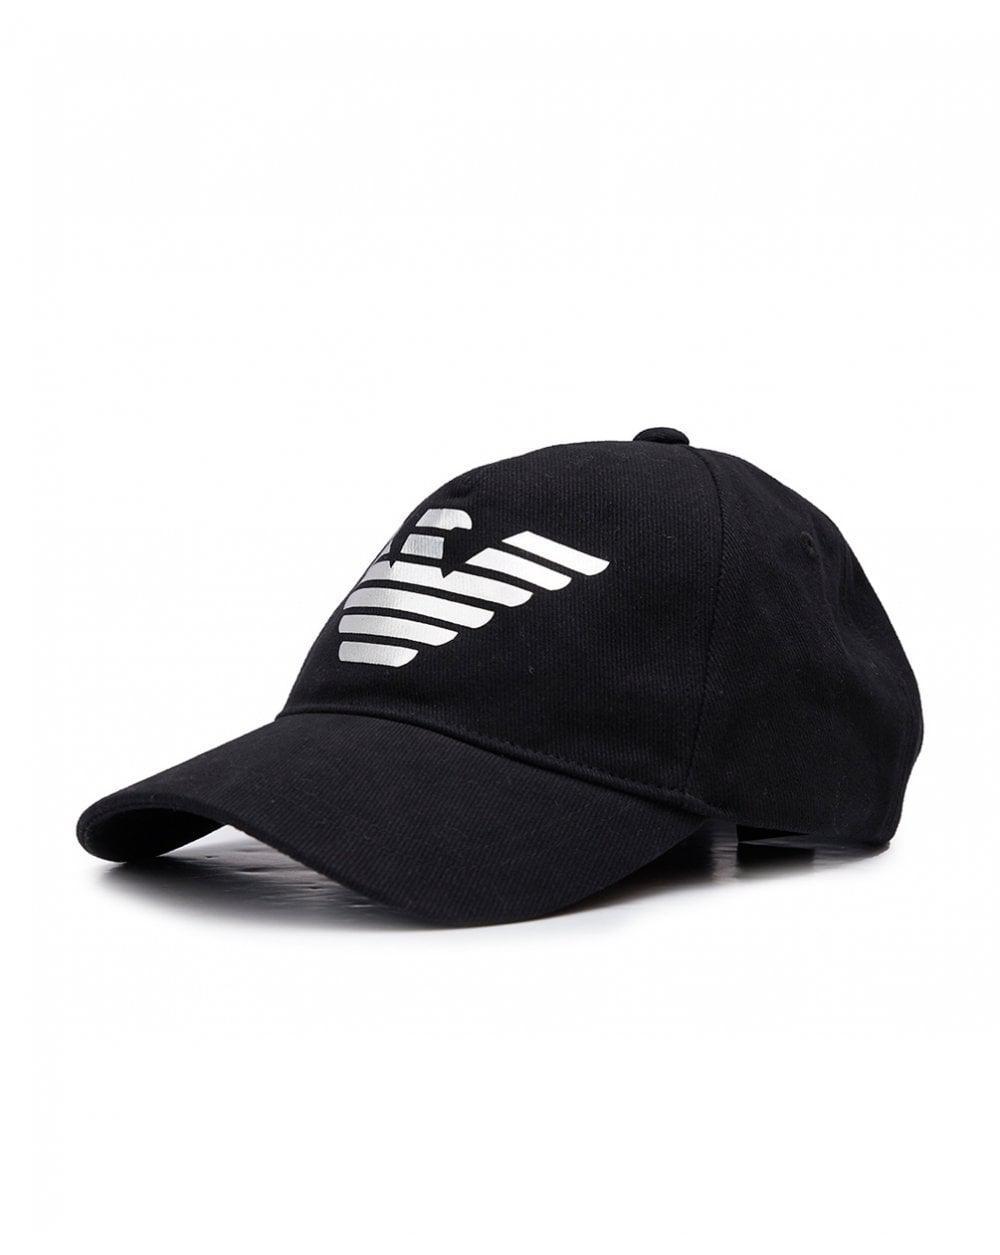 fe1571938e8 Armani Jeans Metallic Eagle Logo Cap in Black for Men - Lyst